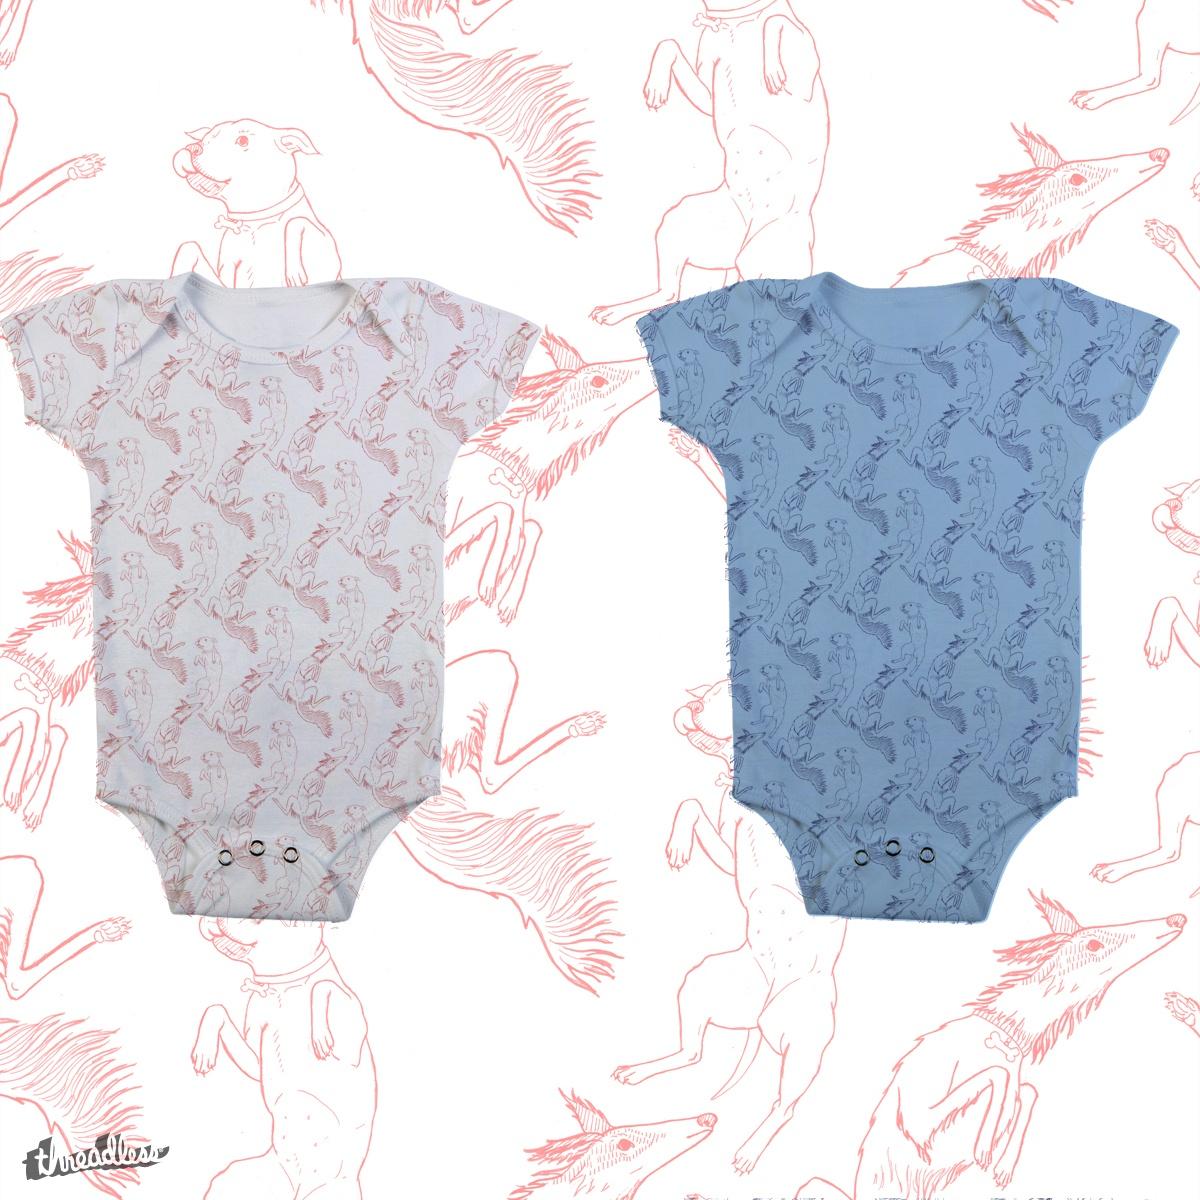 Belly Pattern by BriGilmartin on Threadless